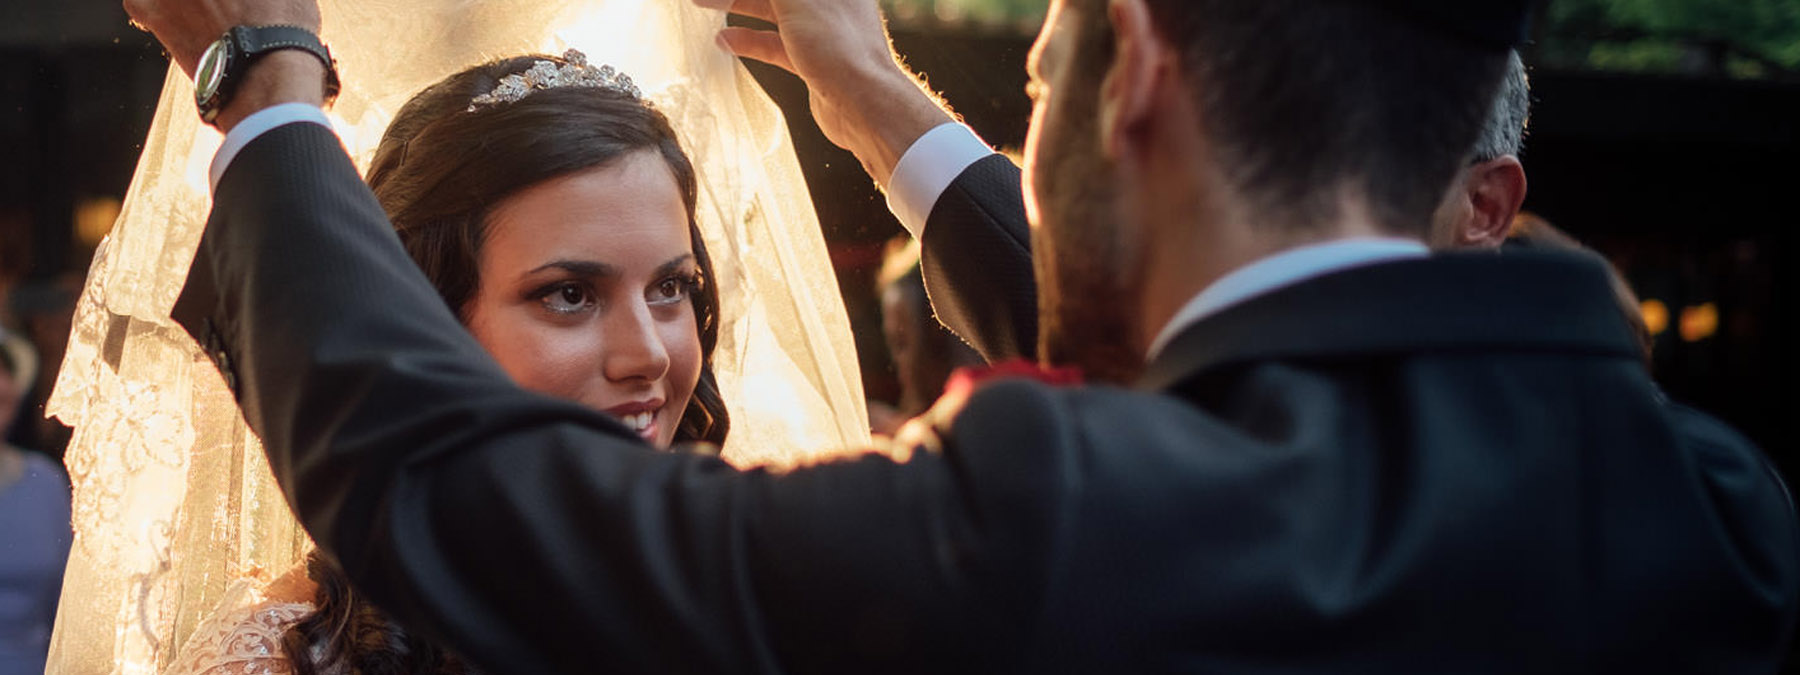 matrimoni ebraici a roma - casina valadier